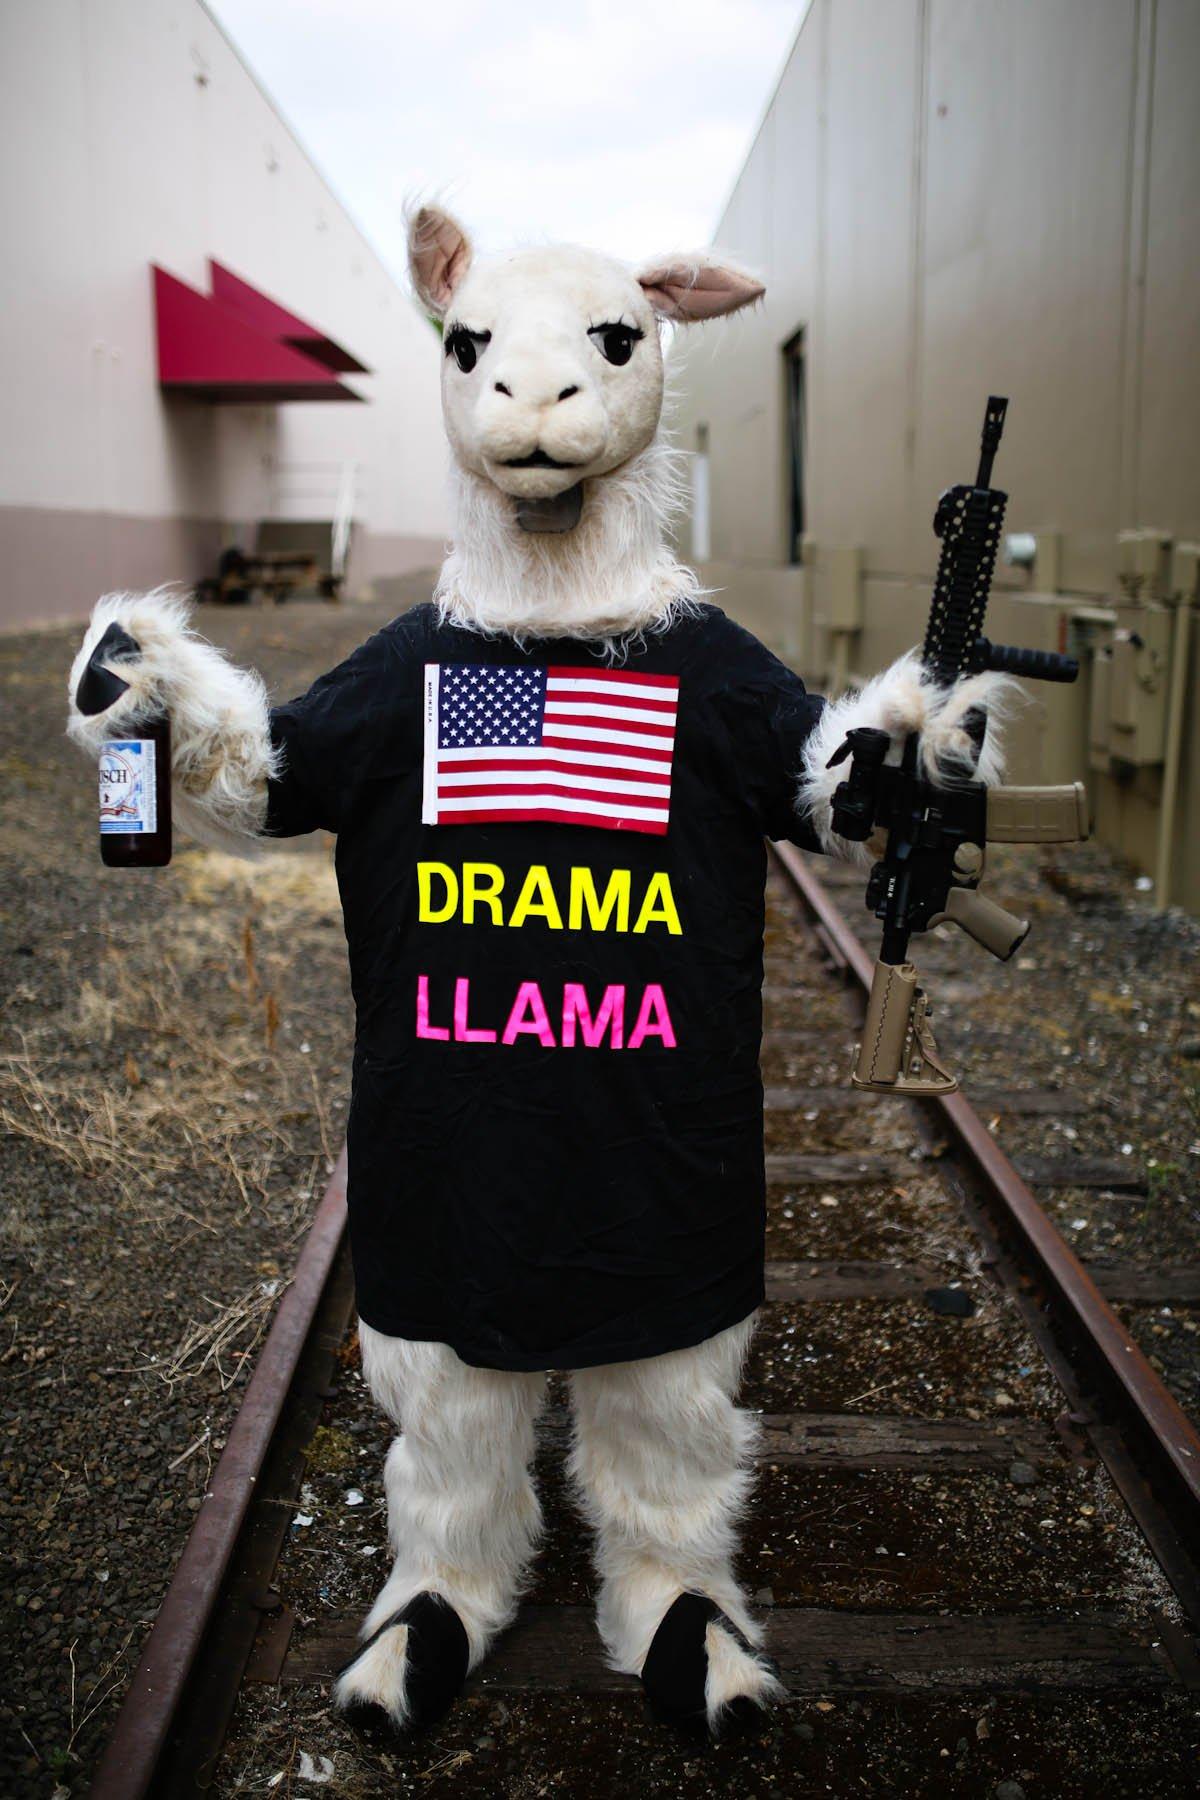 Drama Llama in the USA